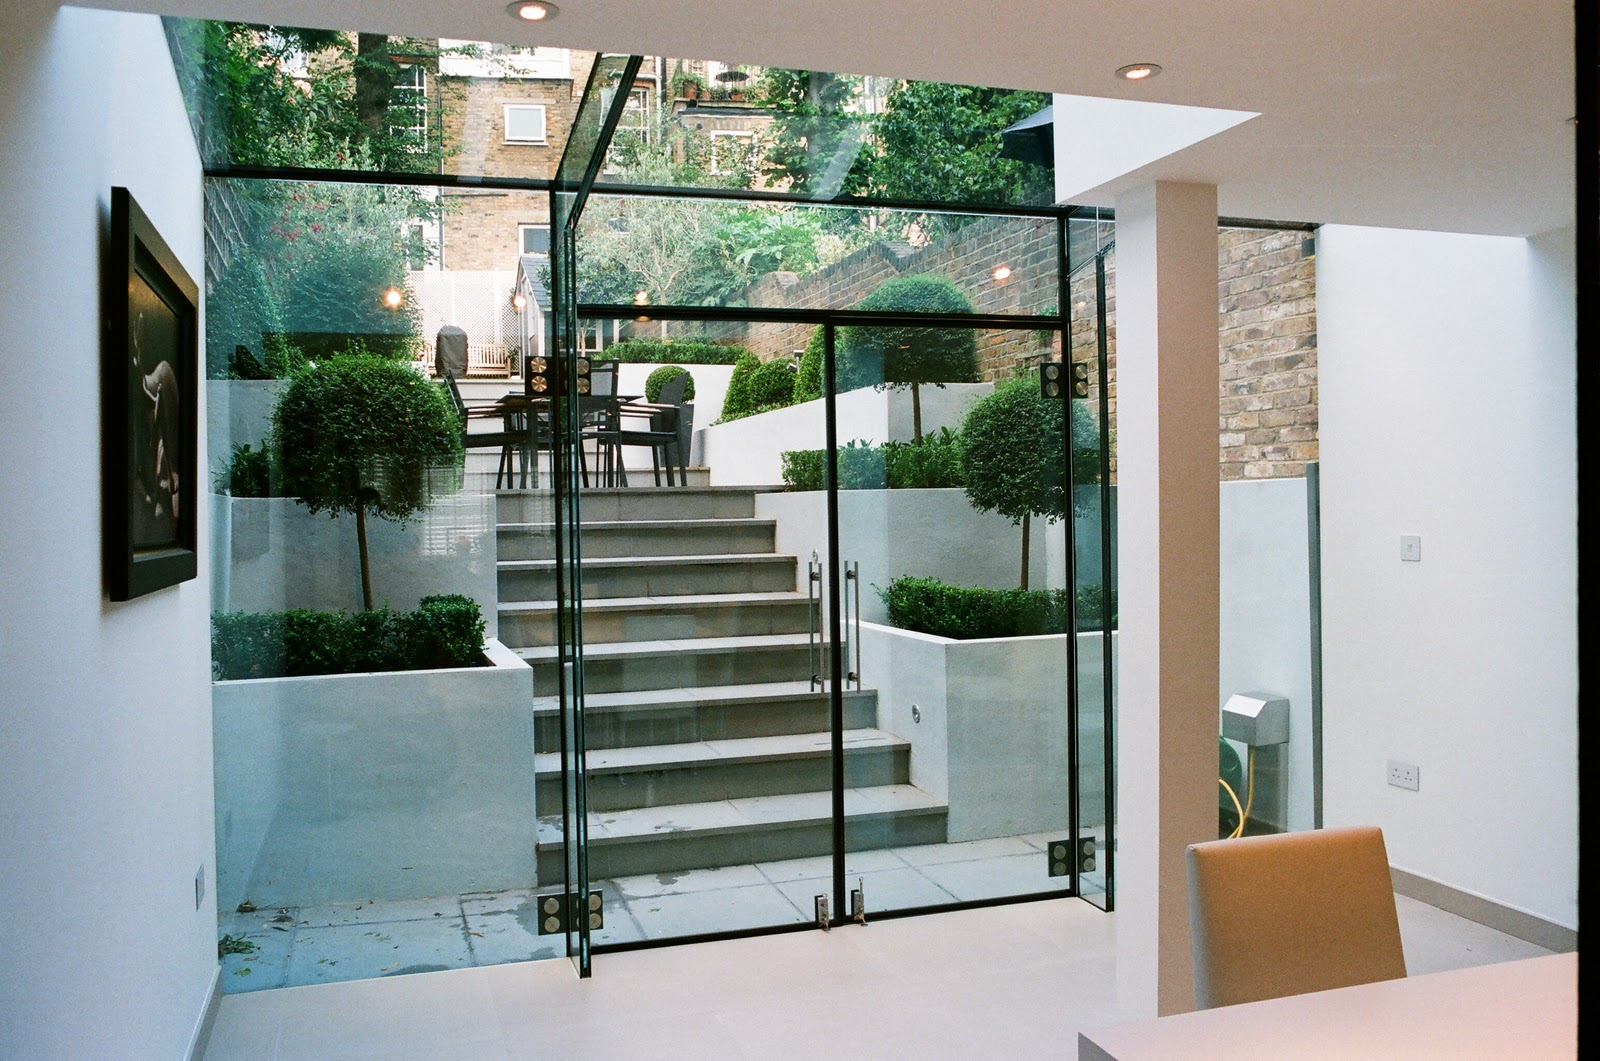 basements extensions idea glass boxes house exten. Black Bedroom Furniture Sets. Home Design Ideas